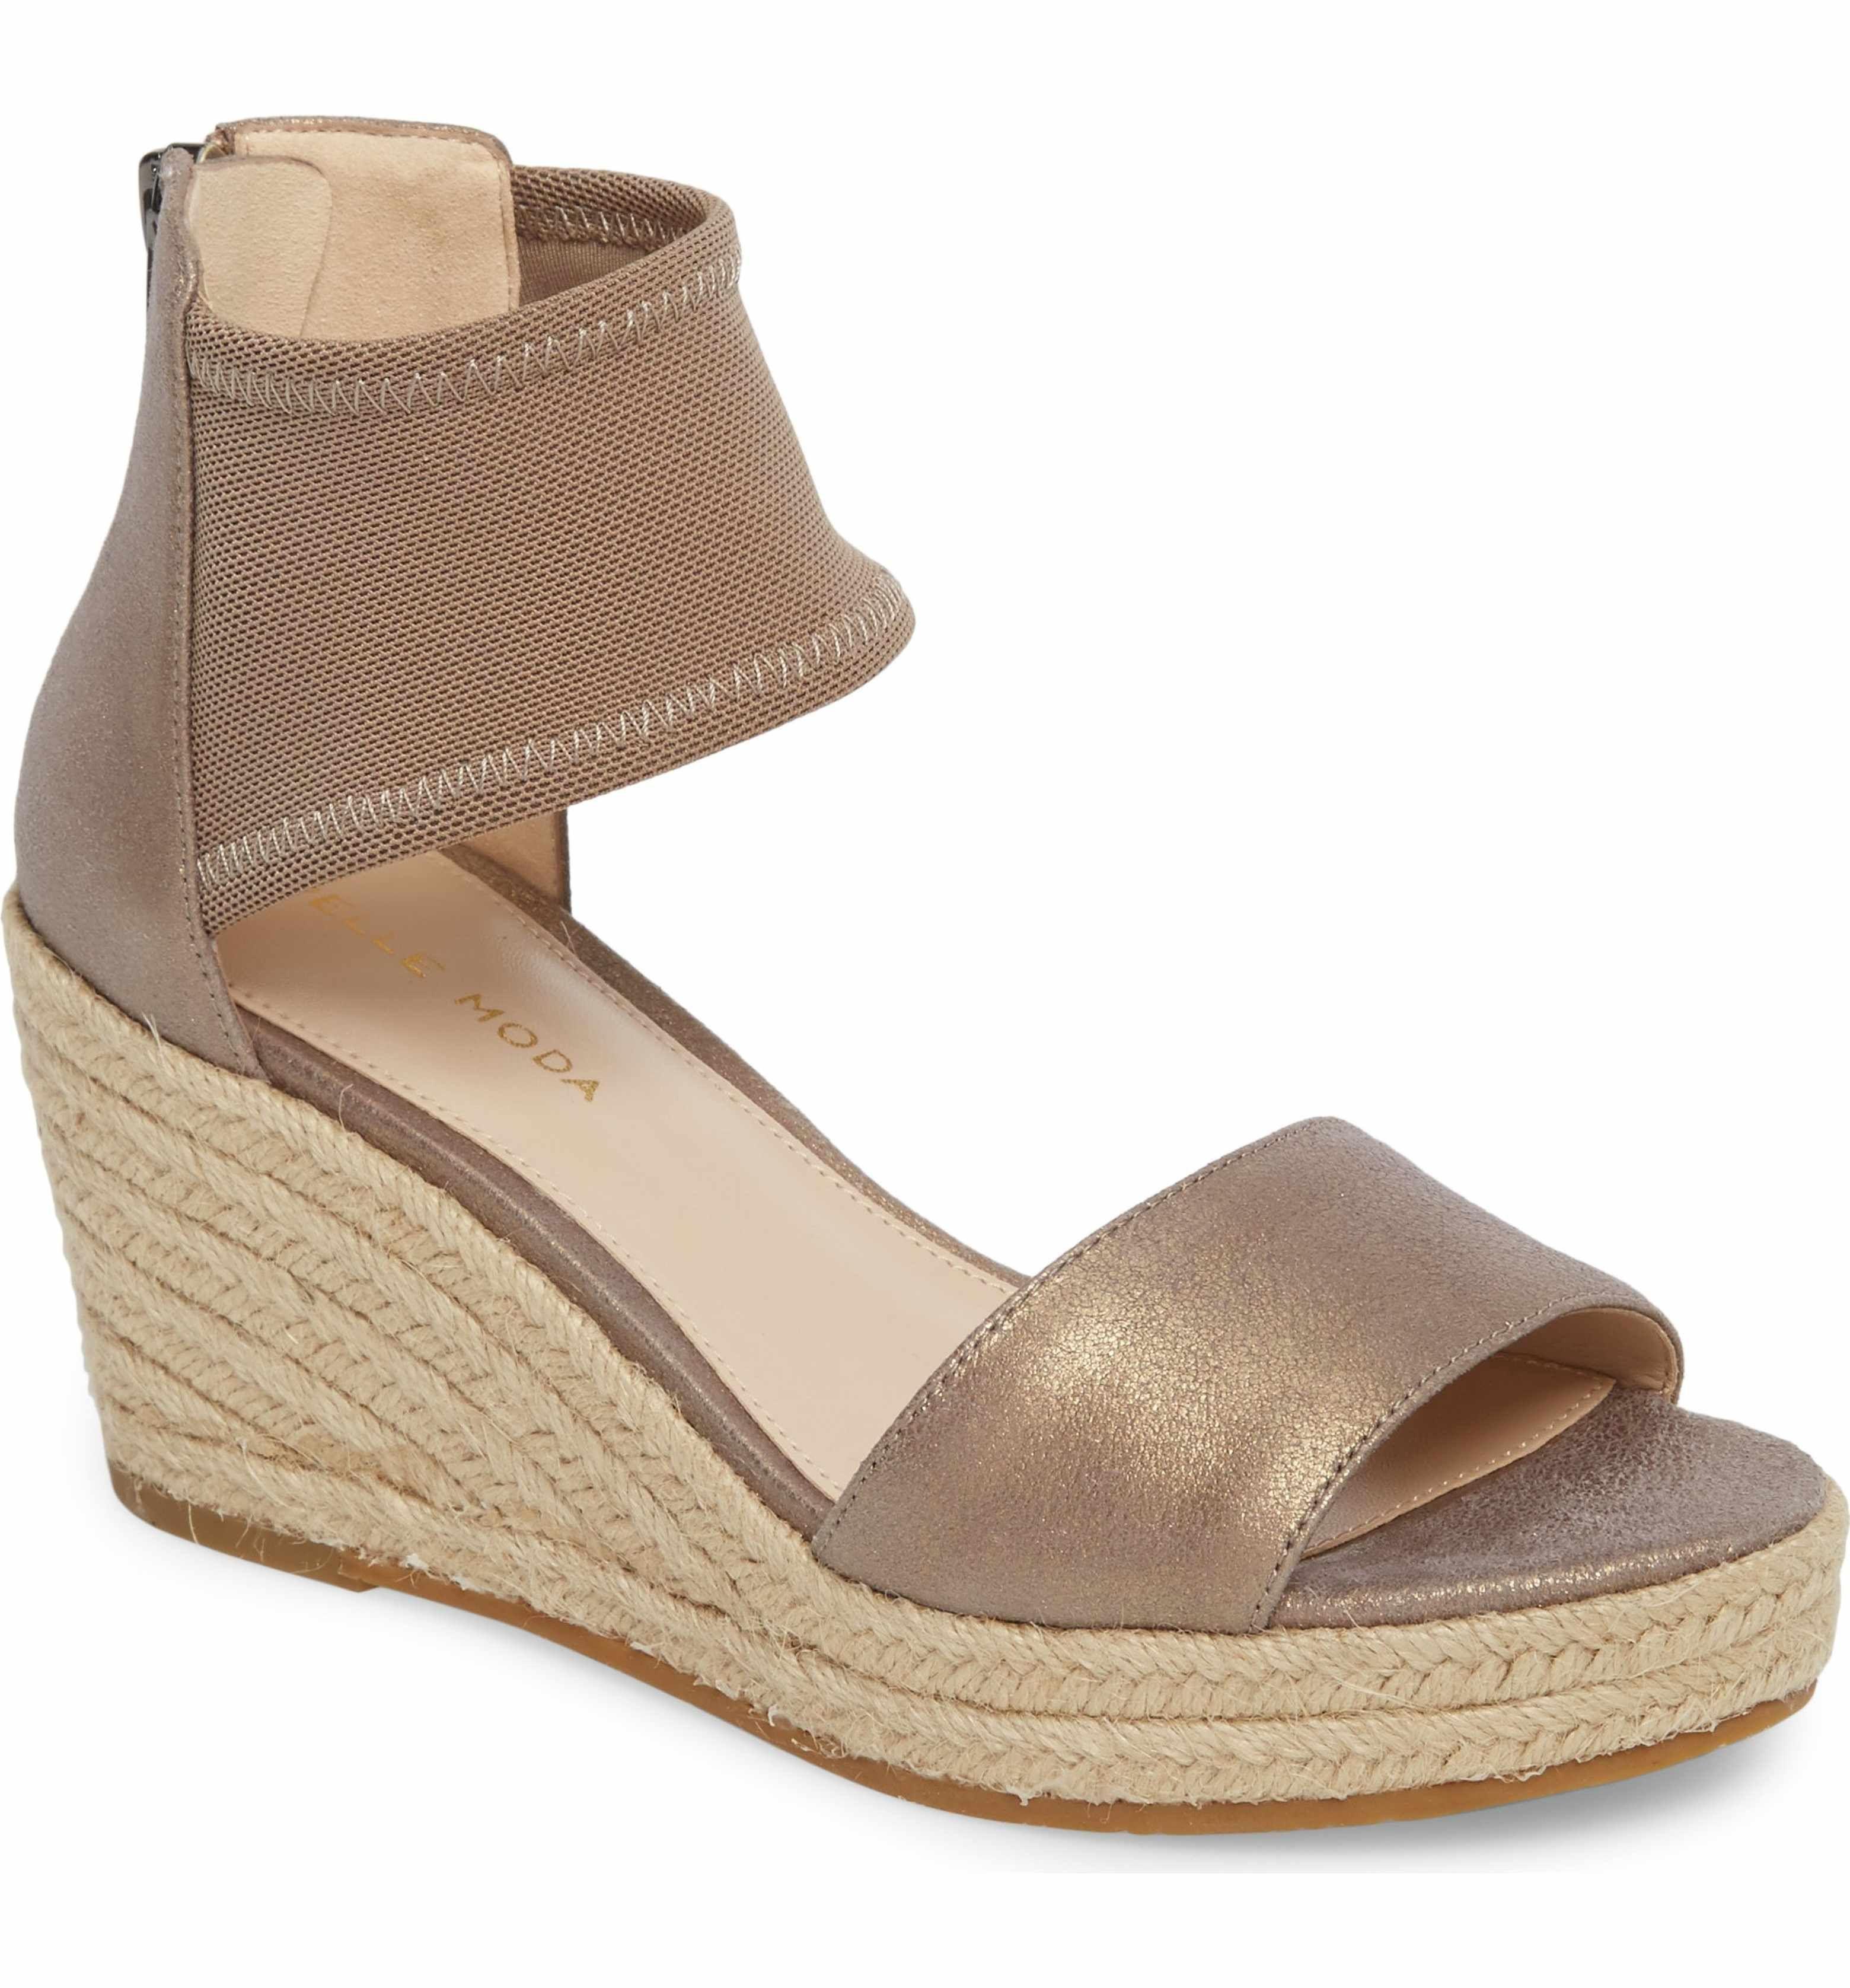 401c7feb0e5 Main Image - Pelle Moda Kona Platform Wedge Sandal (Women)